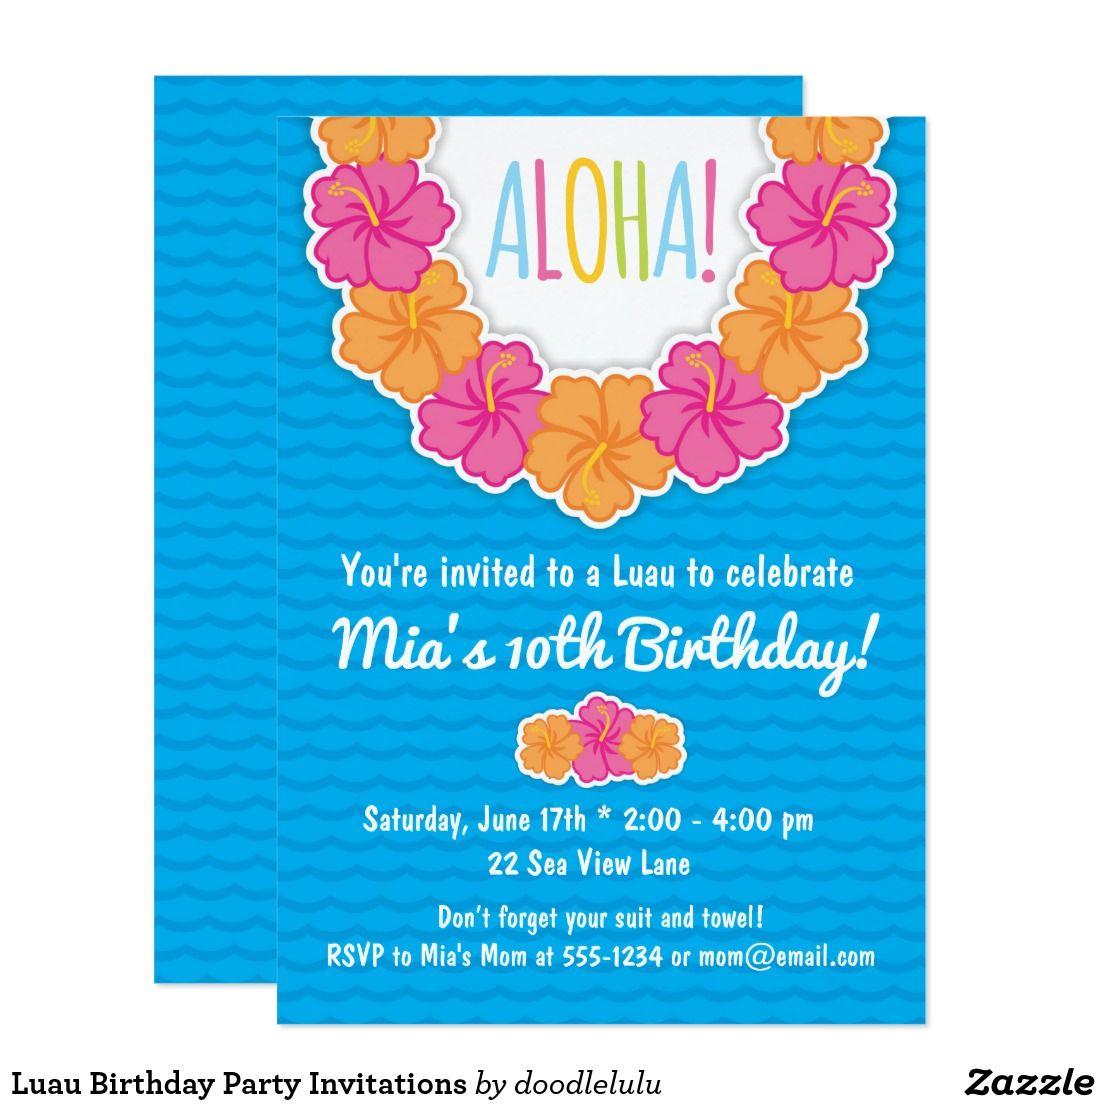 Luau Birthday Party Invitations Zazzle Com Birthday Party